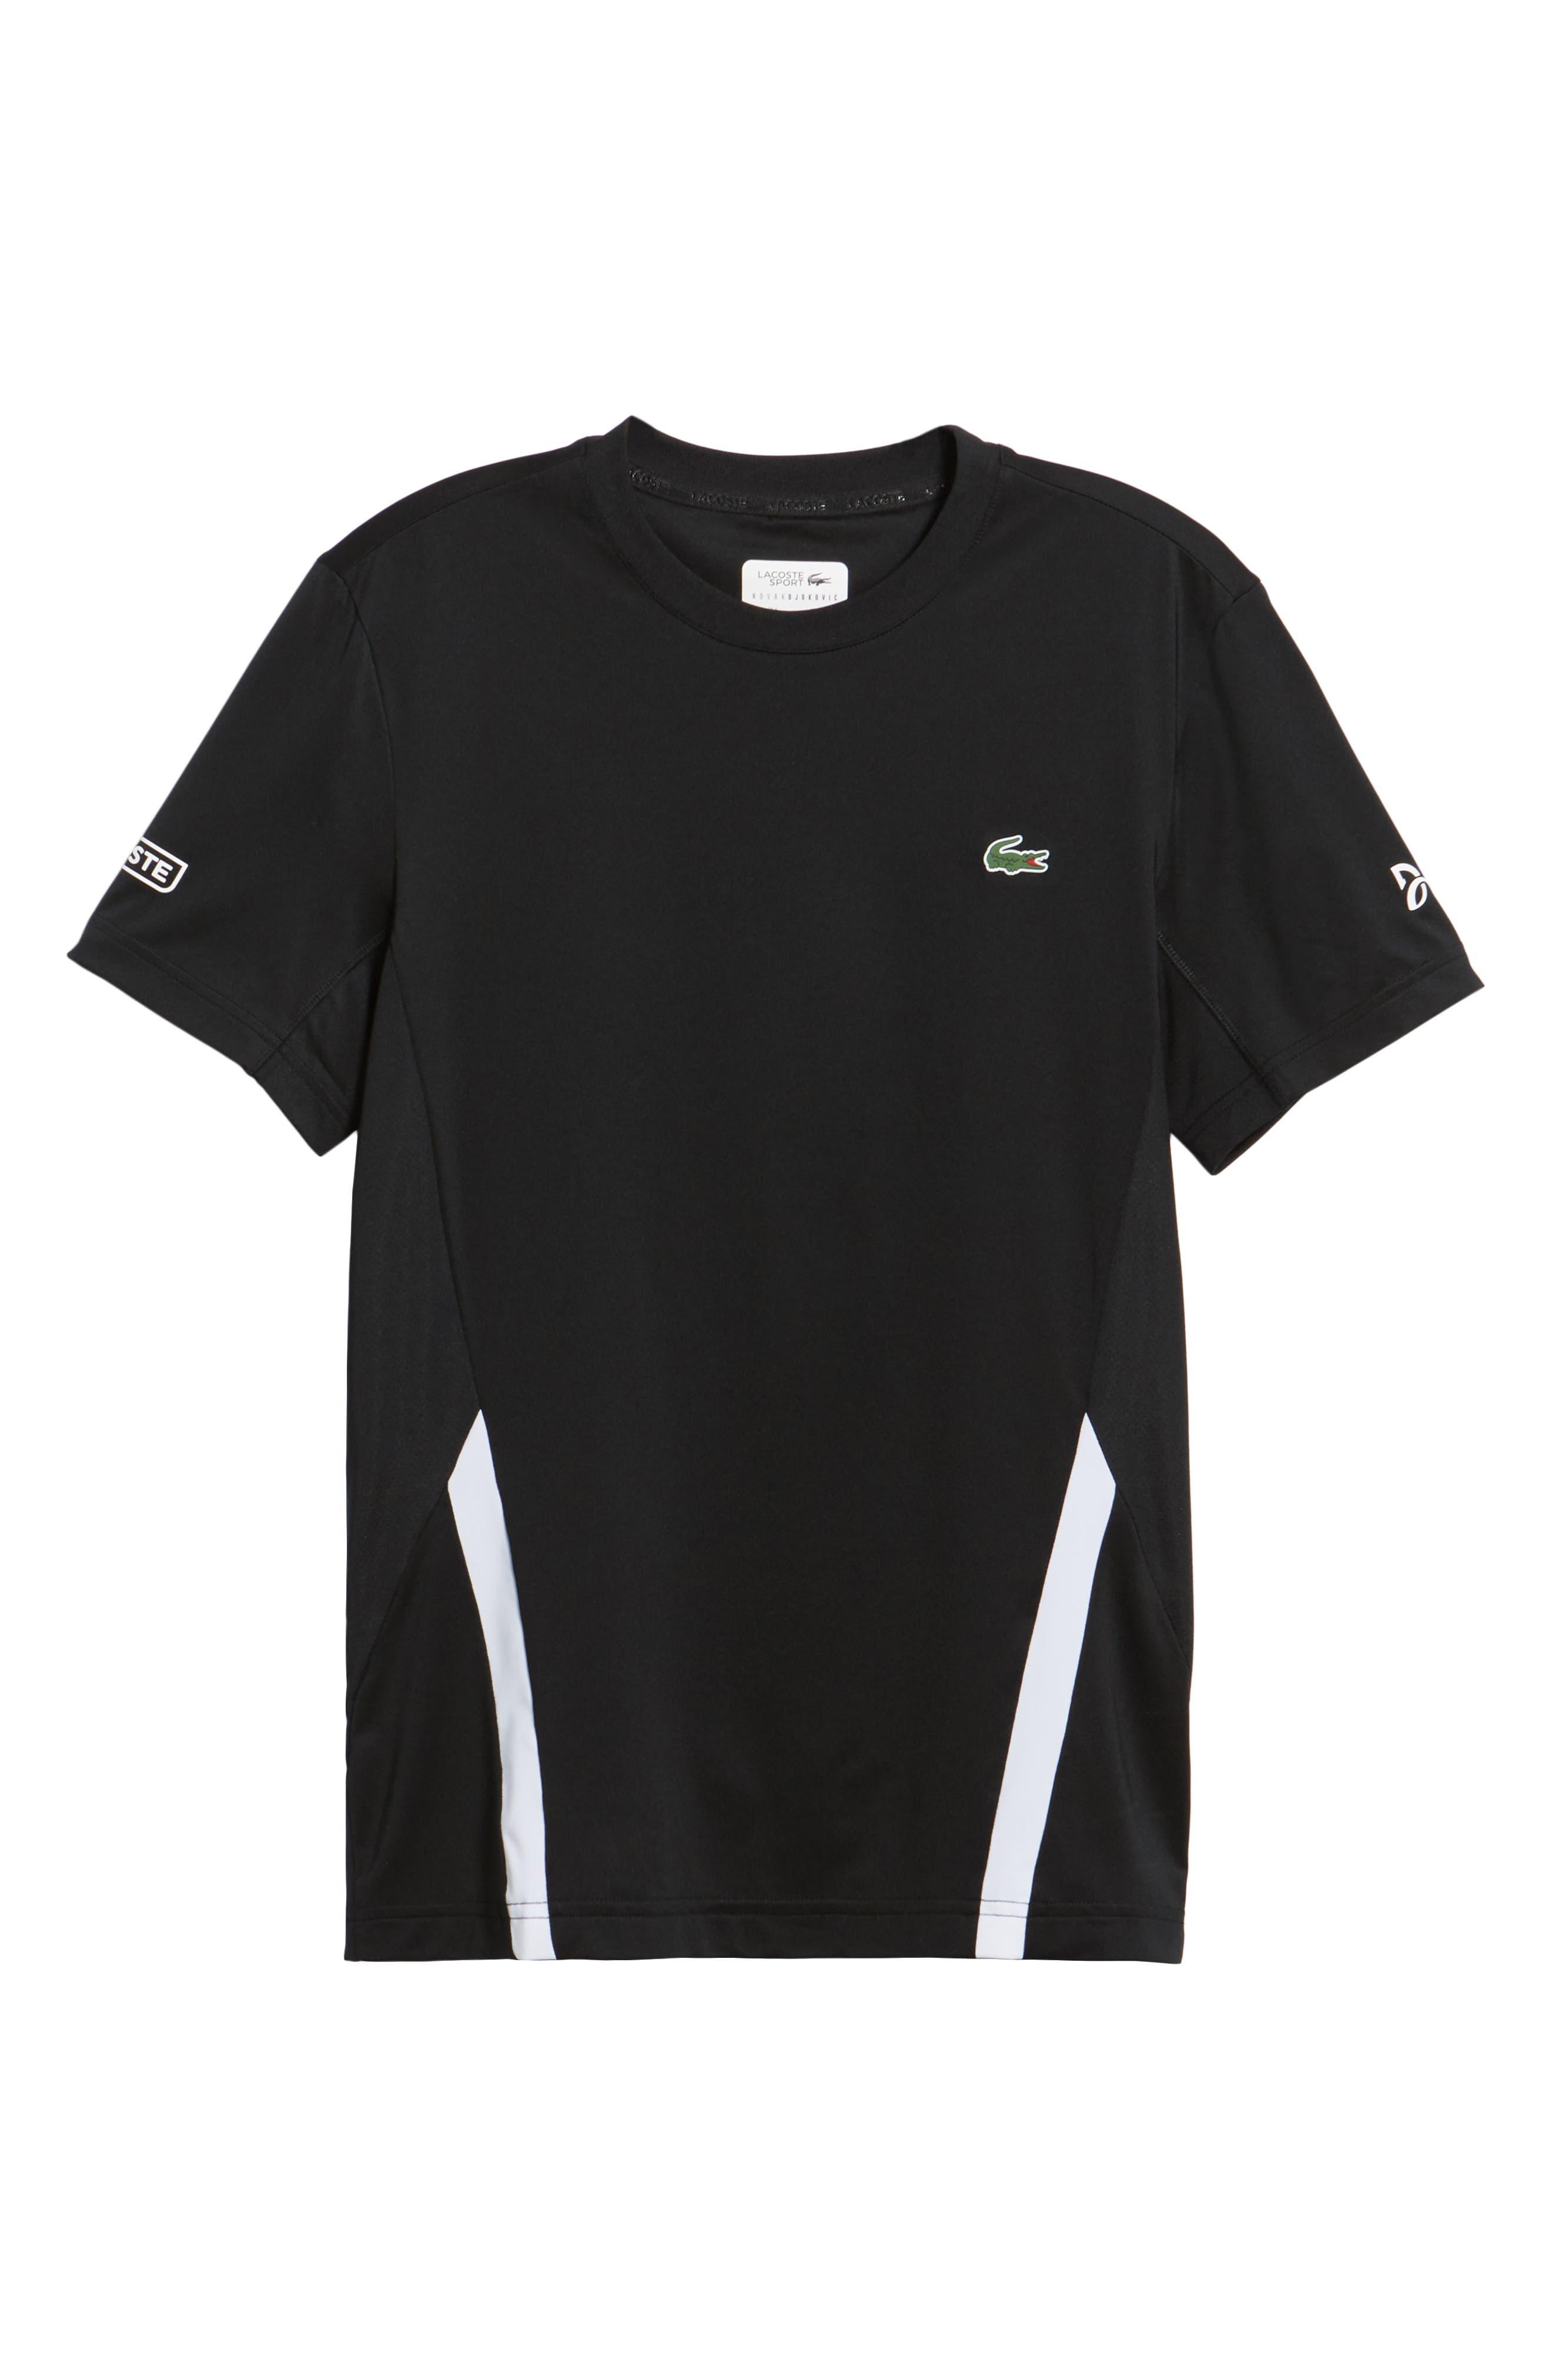 Regular Fit Novak Performance T-Shirt,                             Alternate thumbnail 6, color,                             BLACK/ WHITE